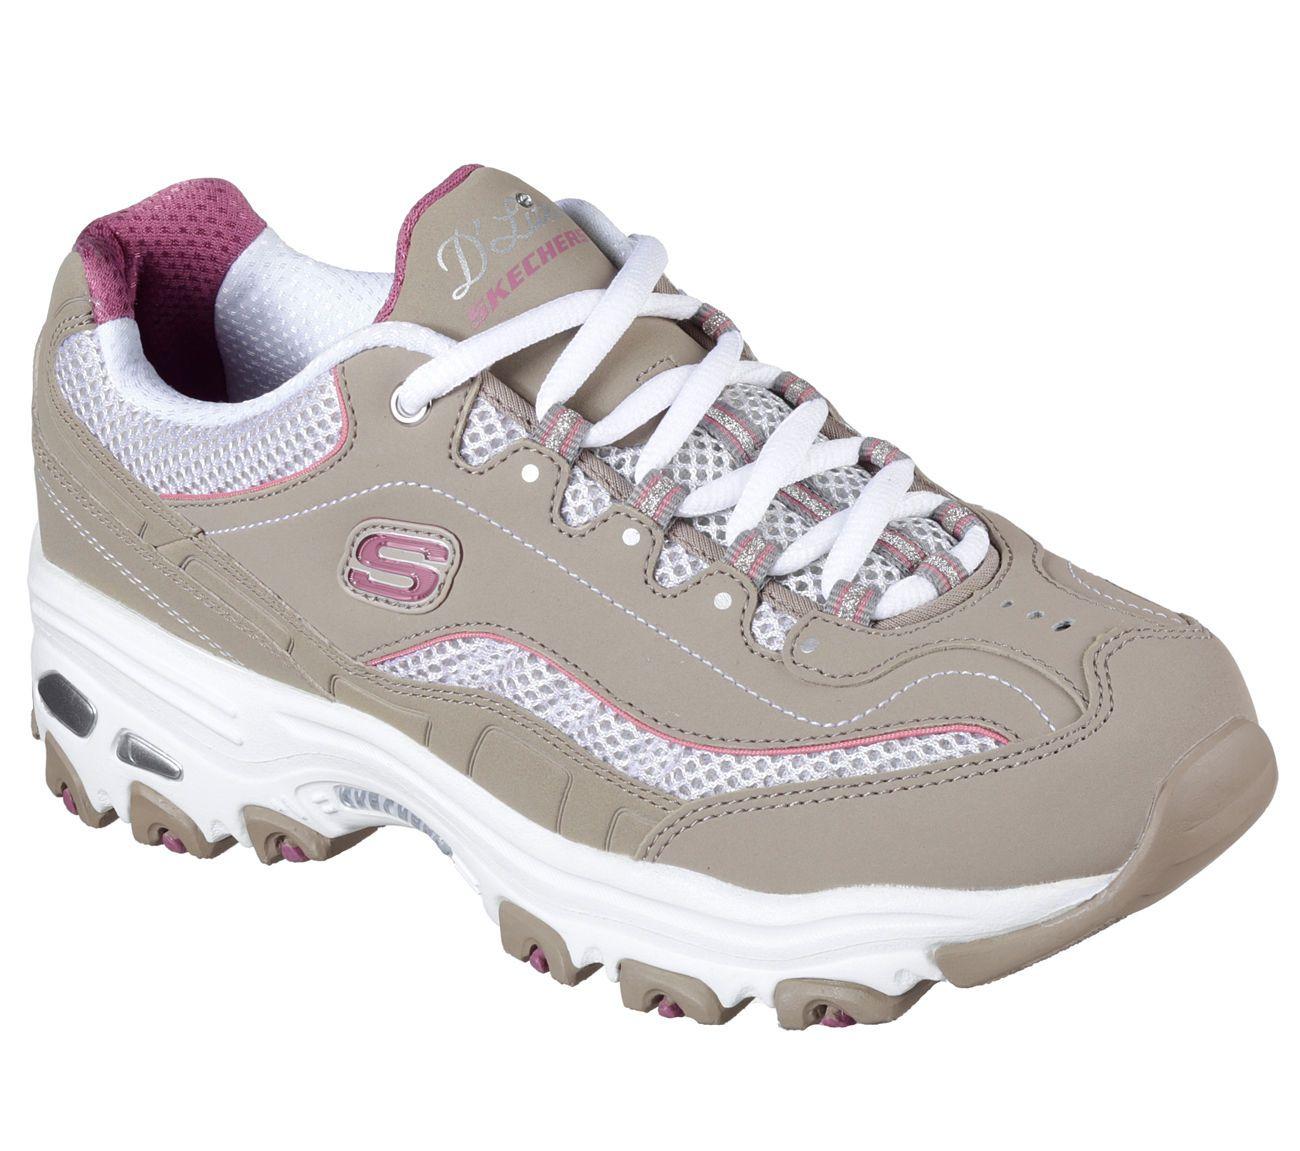 Perth Blackborough Marketing de motores de búsqueda colisión  11860 Taupe Dlites Skechers Shoes Women Sport Casual Comfort Memory Foam  Sneaker | Skechers shoes women, Skechers shoes, Skechers